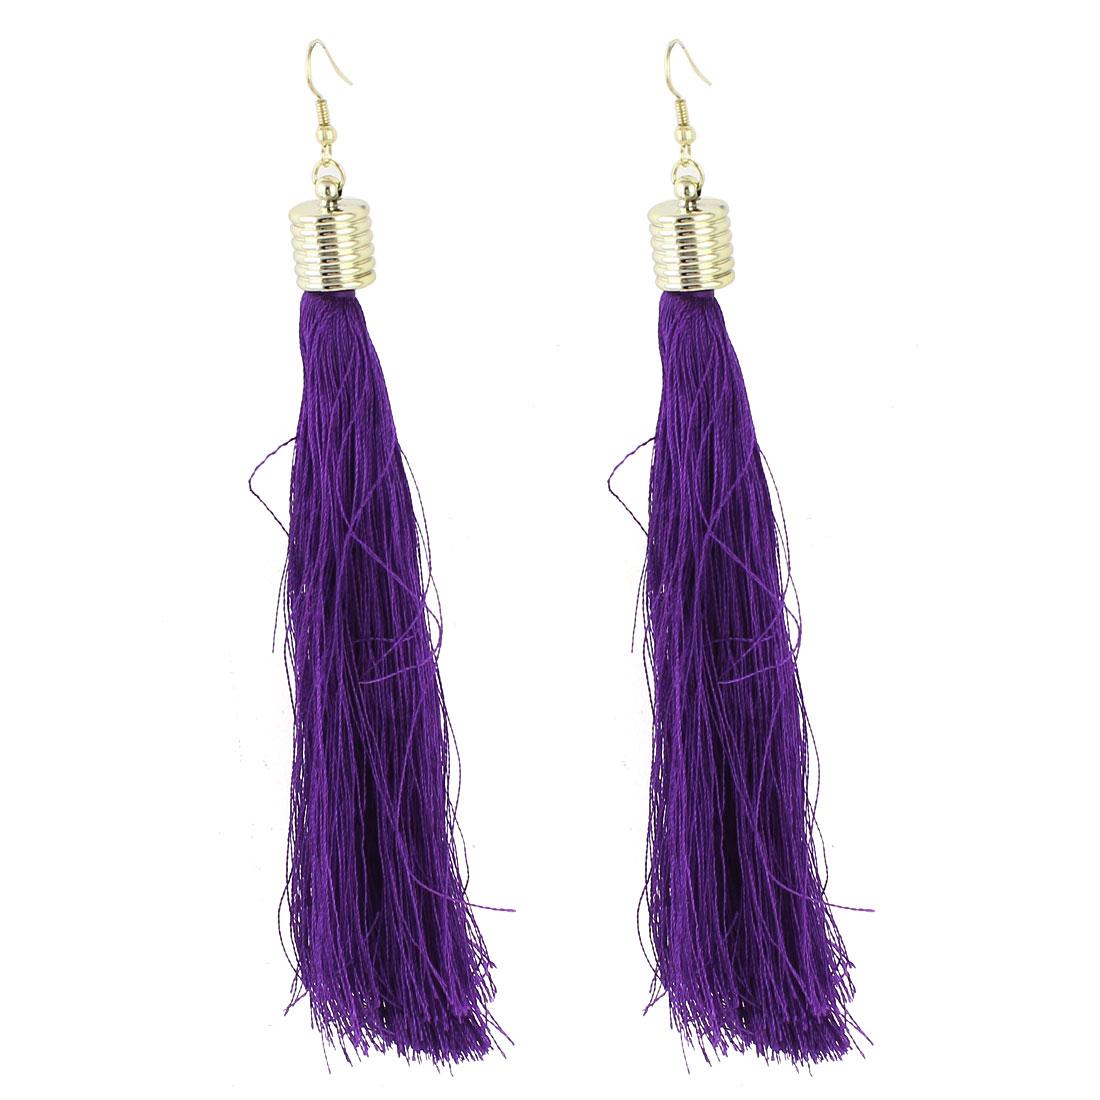 Ladies Ear Decoration Nylon Tassels Pendant Fish Hook Earrings Purple Pair